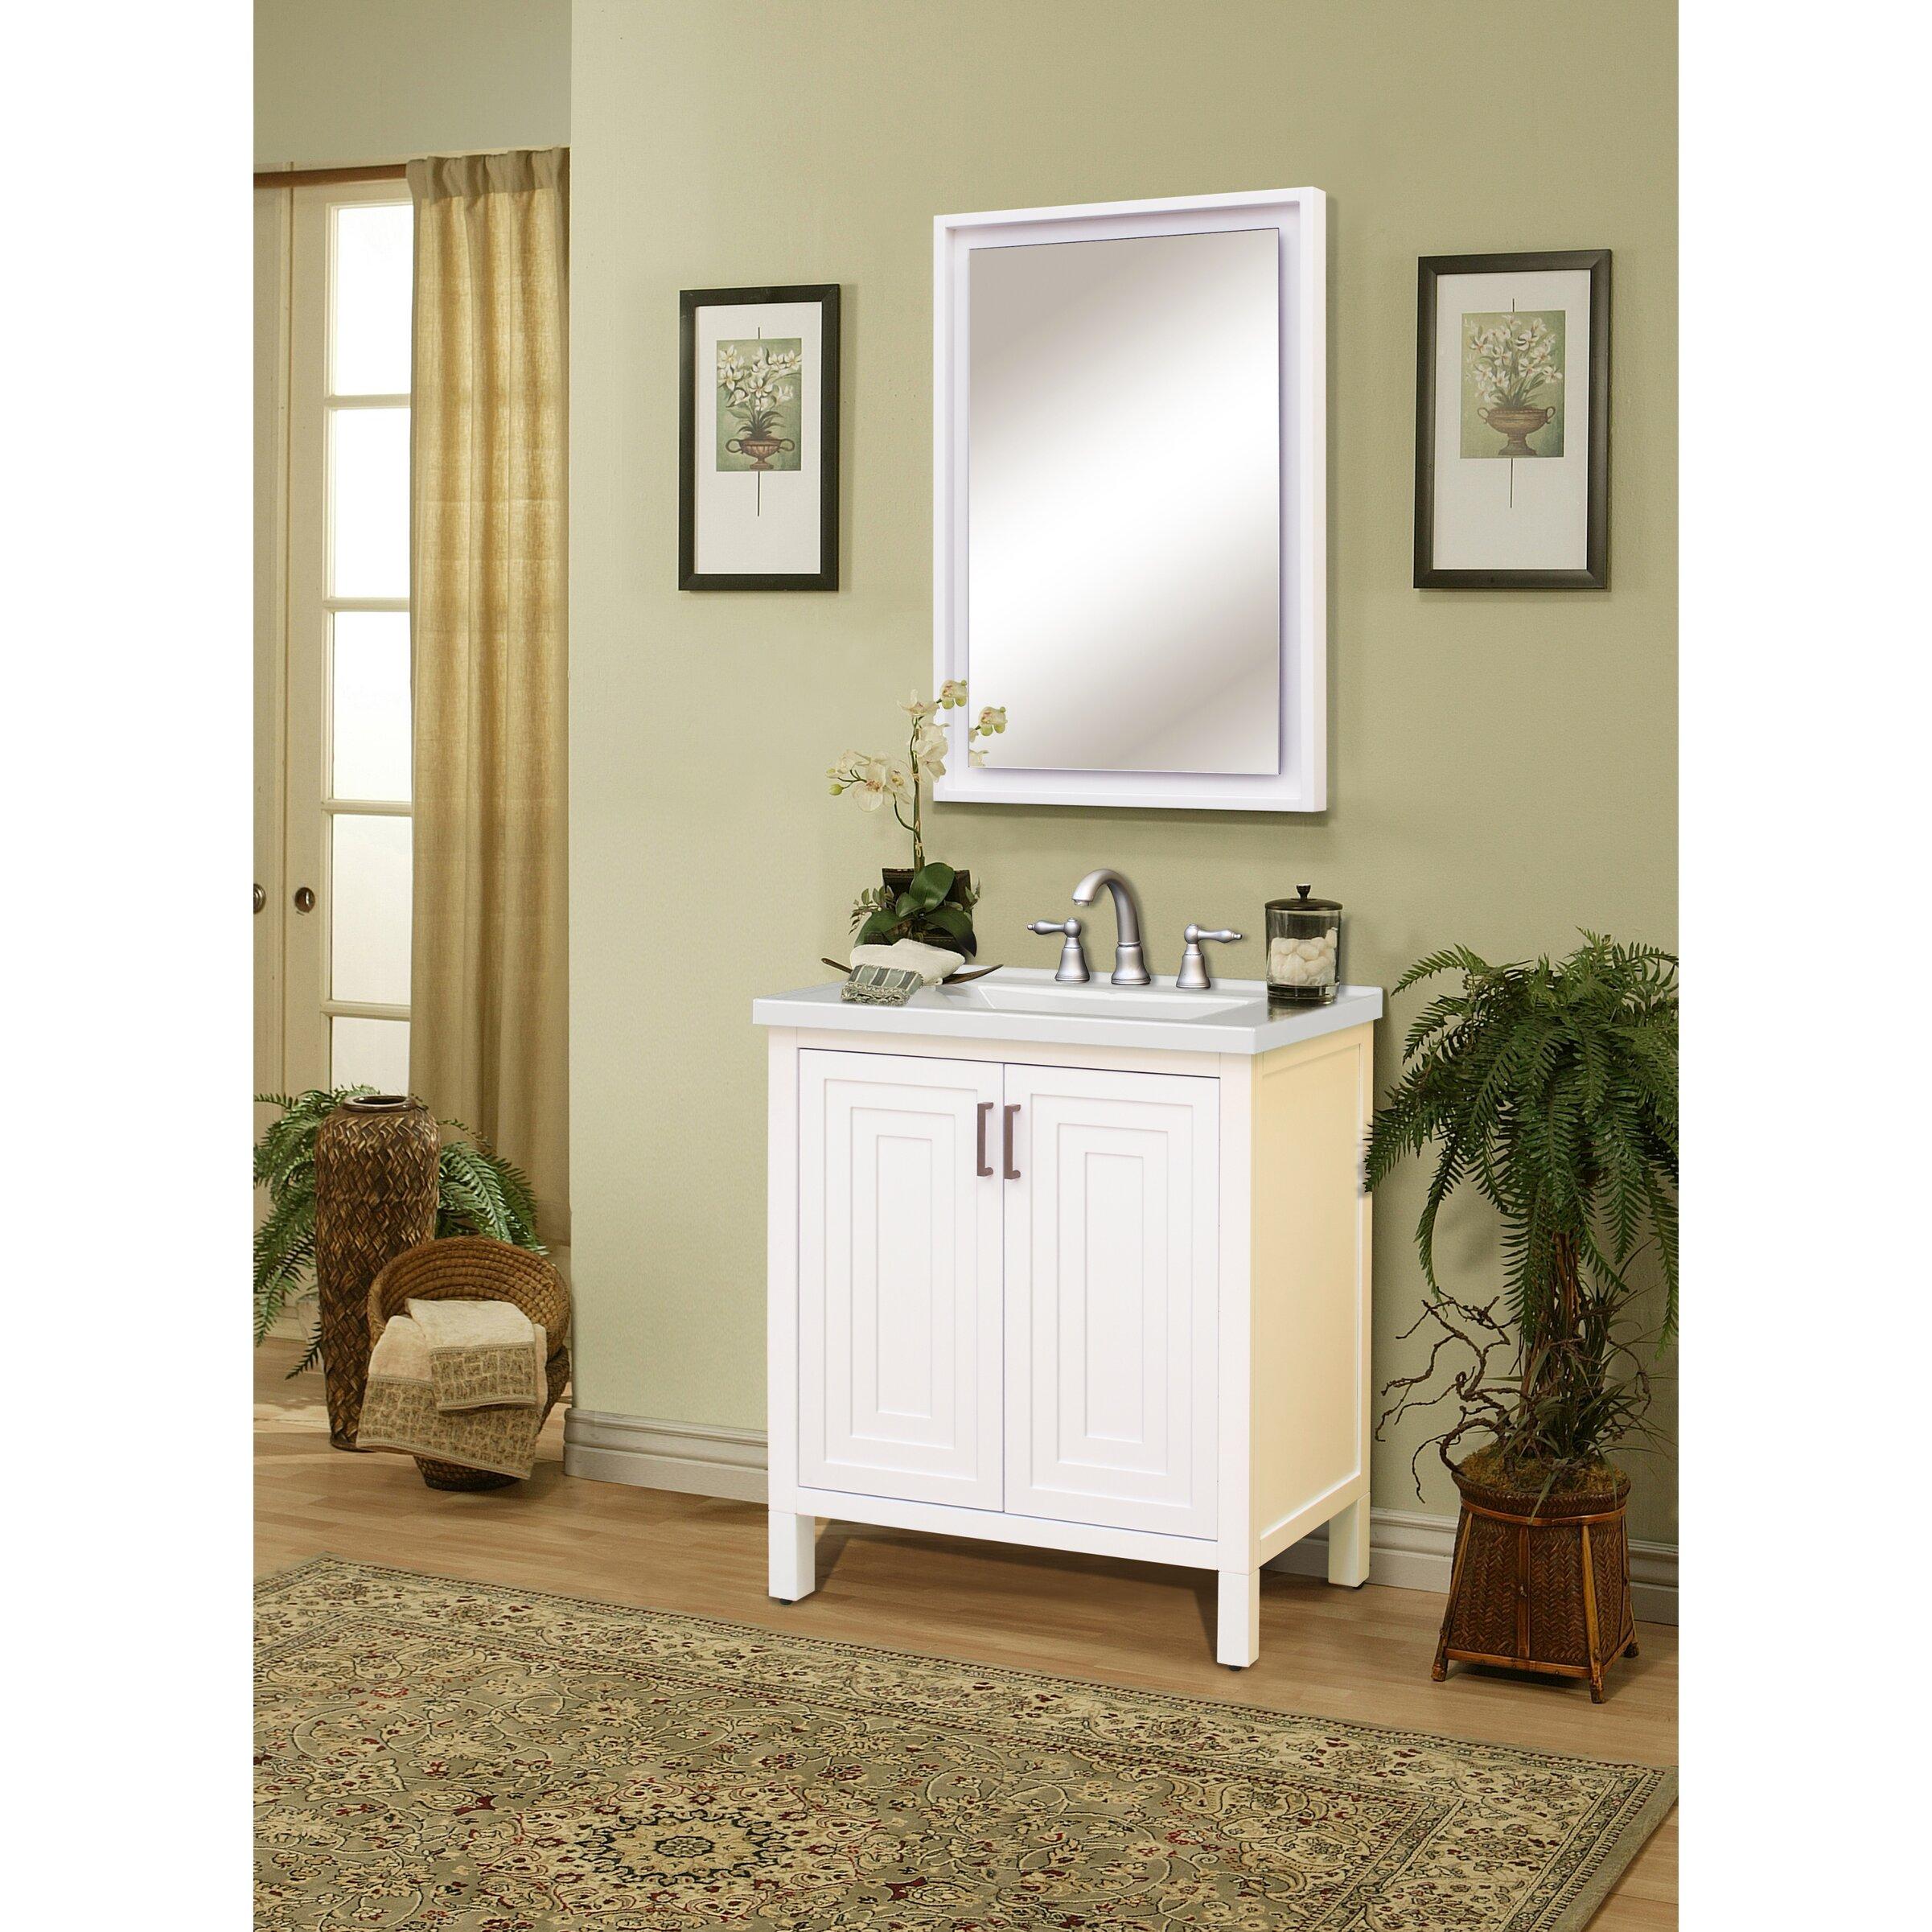 Sagehill premier 31 single bathroom vanity top reviews for Sagehill designs bathroom vanity